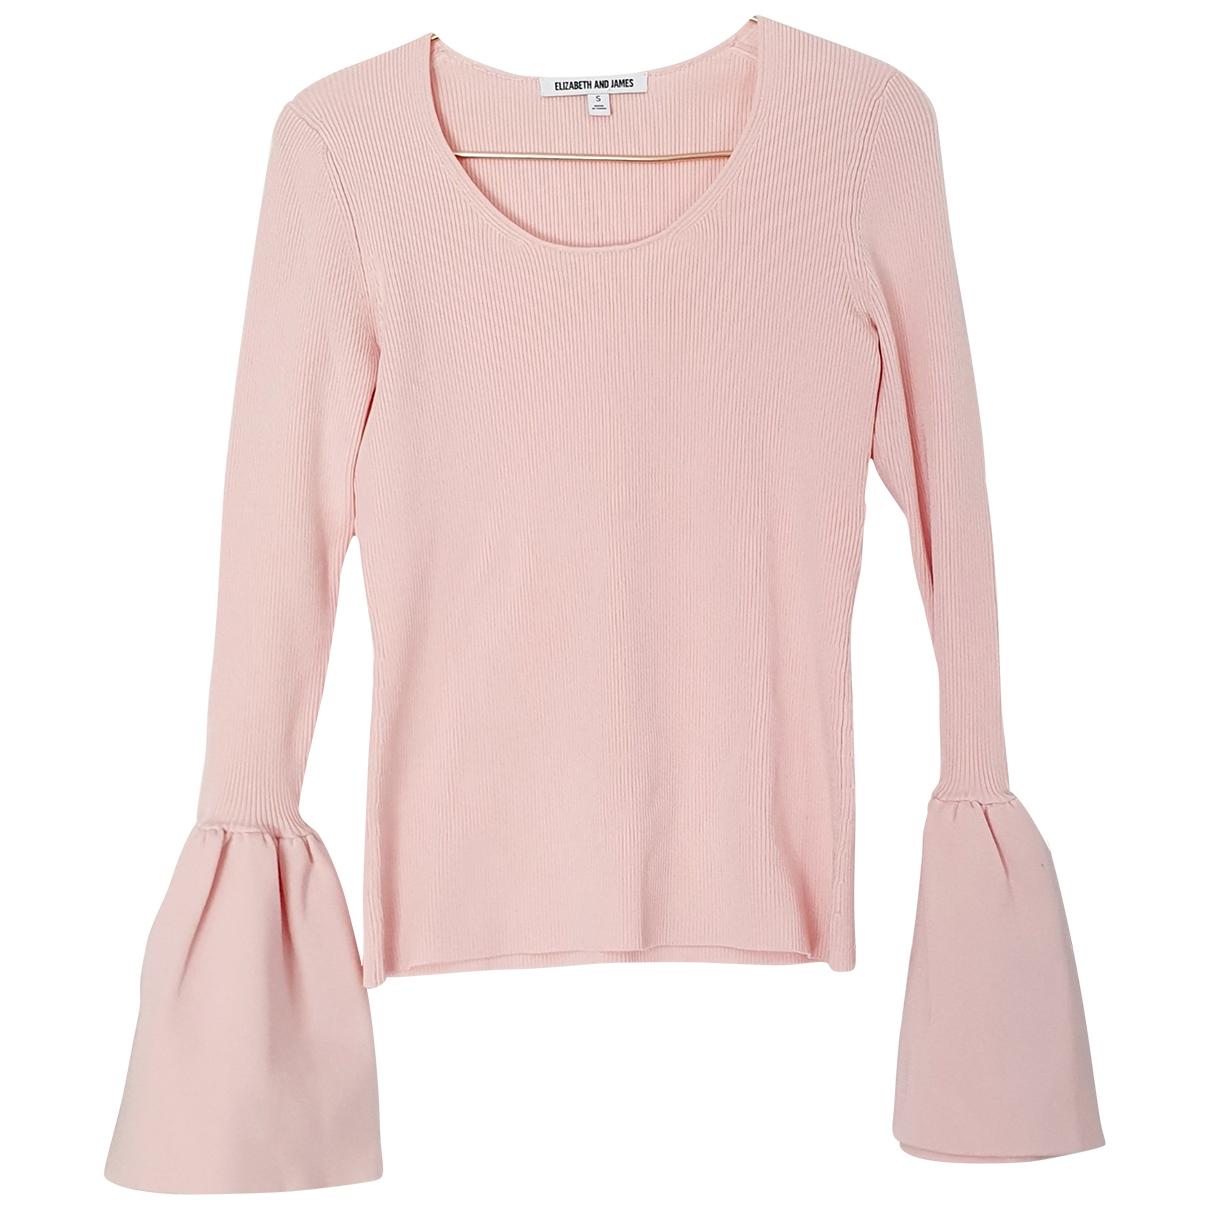 Elizabeth And James \N Pink Knitwear for Women S International